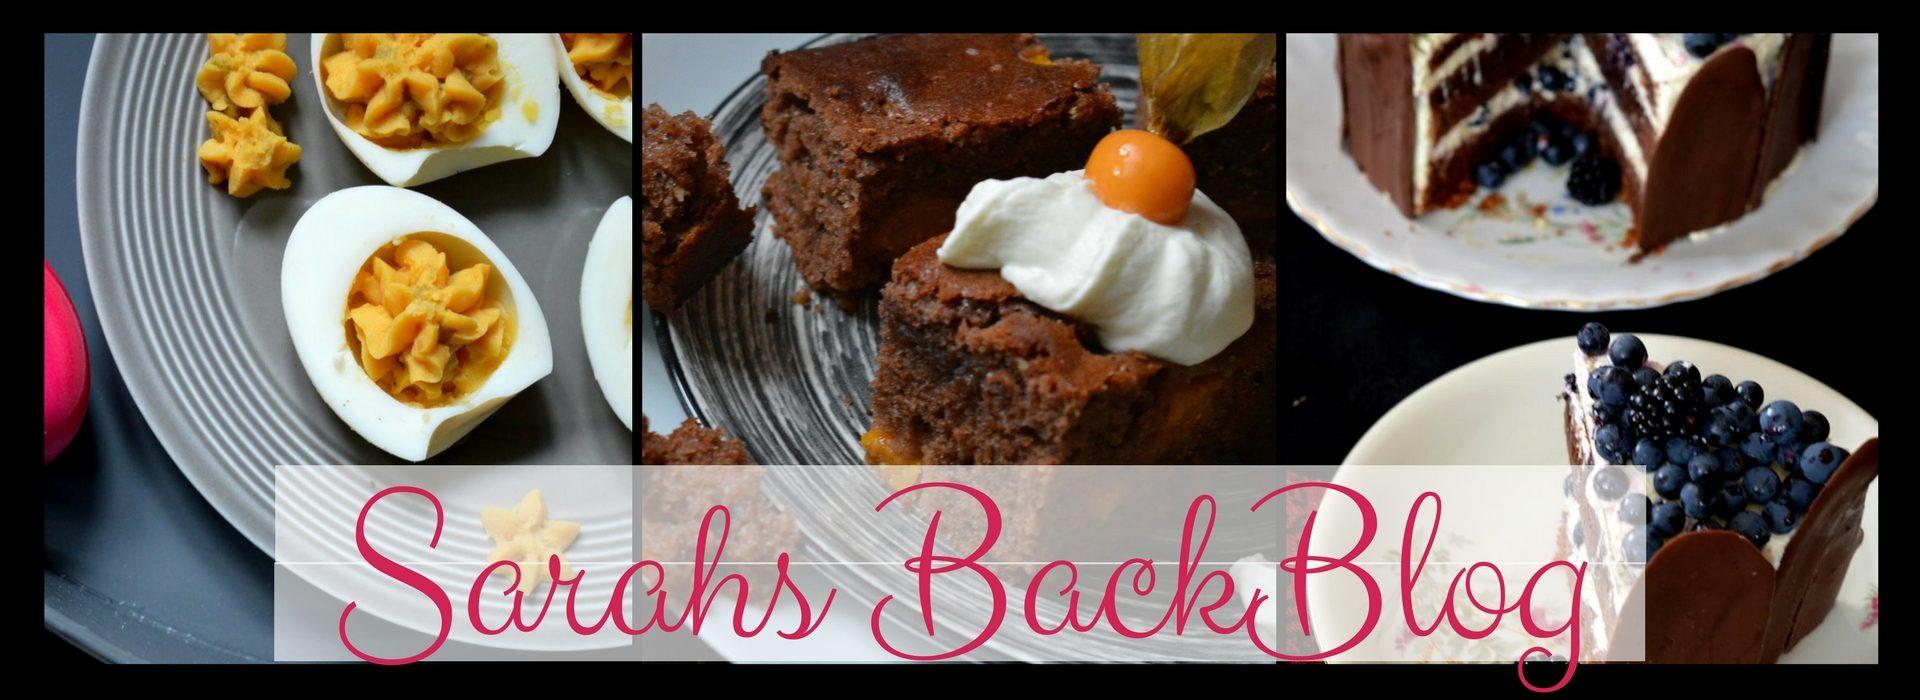 Sarah's BackBlog